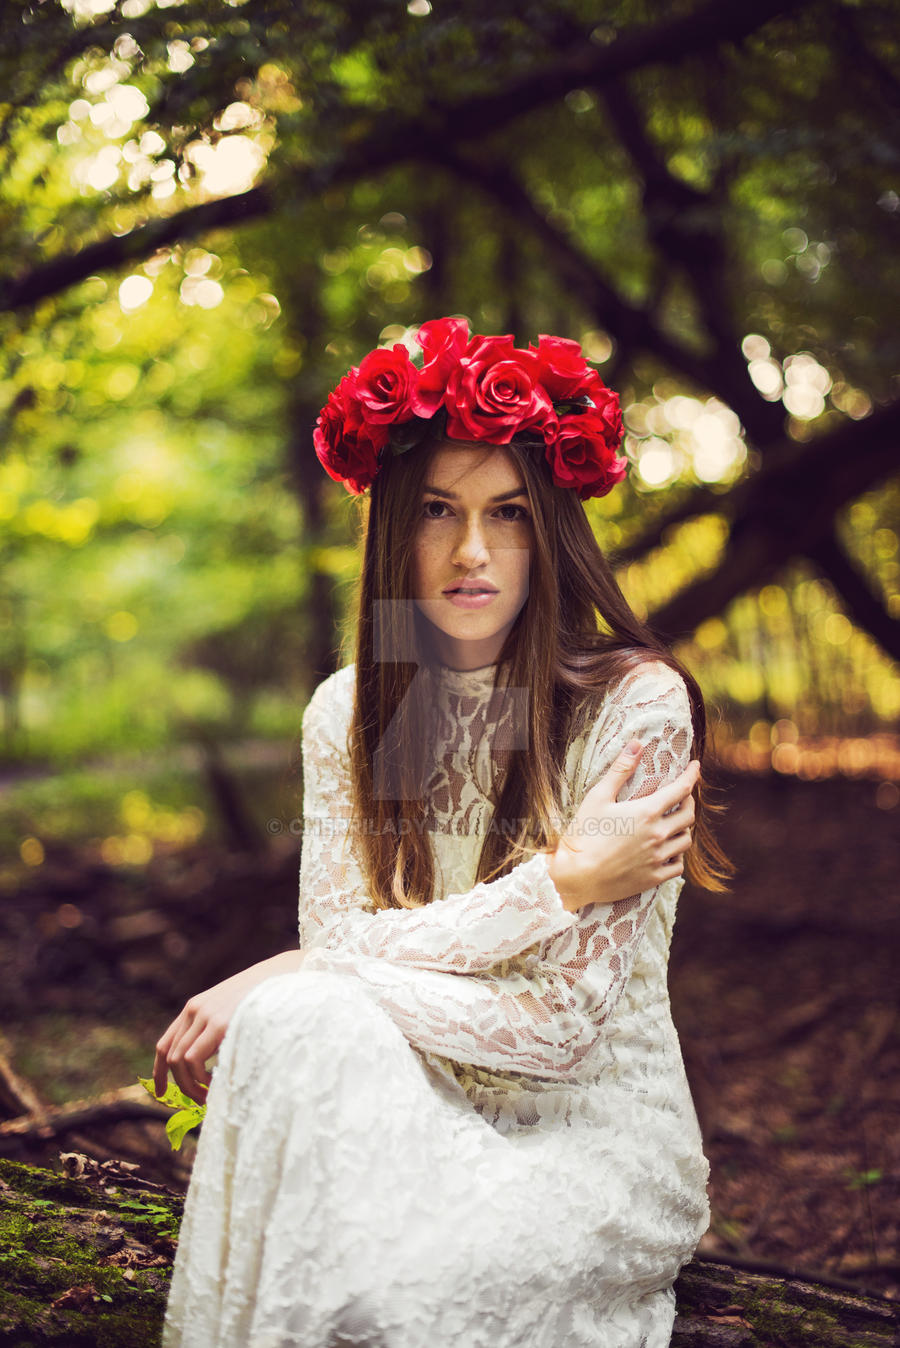 Bride with flower crown ii by cherrilady on deviantart bride with flower crown ii by cherrilady izmirmasajfo